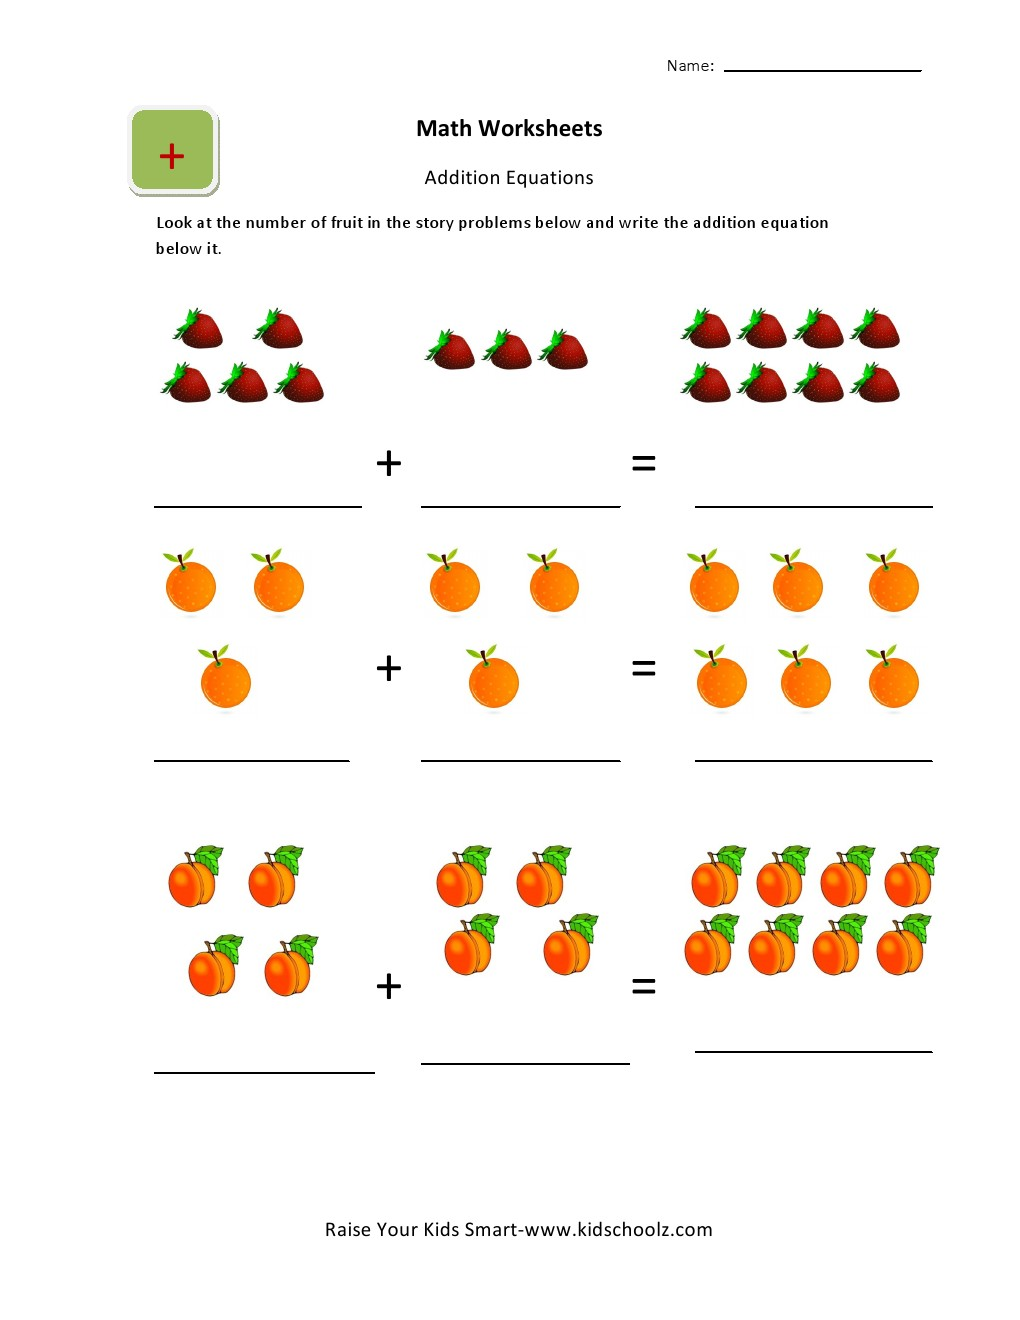 hight resolution of UKG-Basic Picture Addition Worksheets for Kids - Kidschoolz